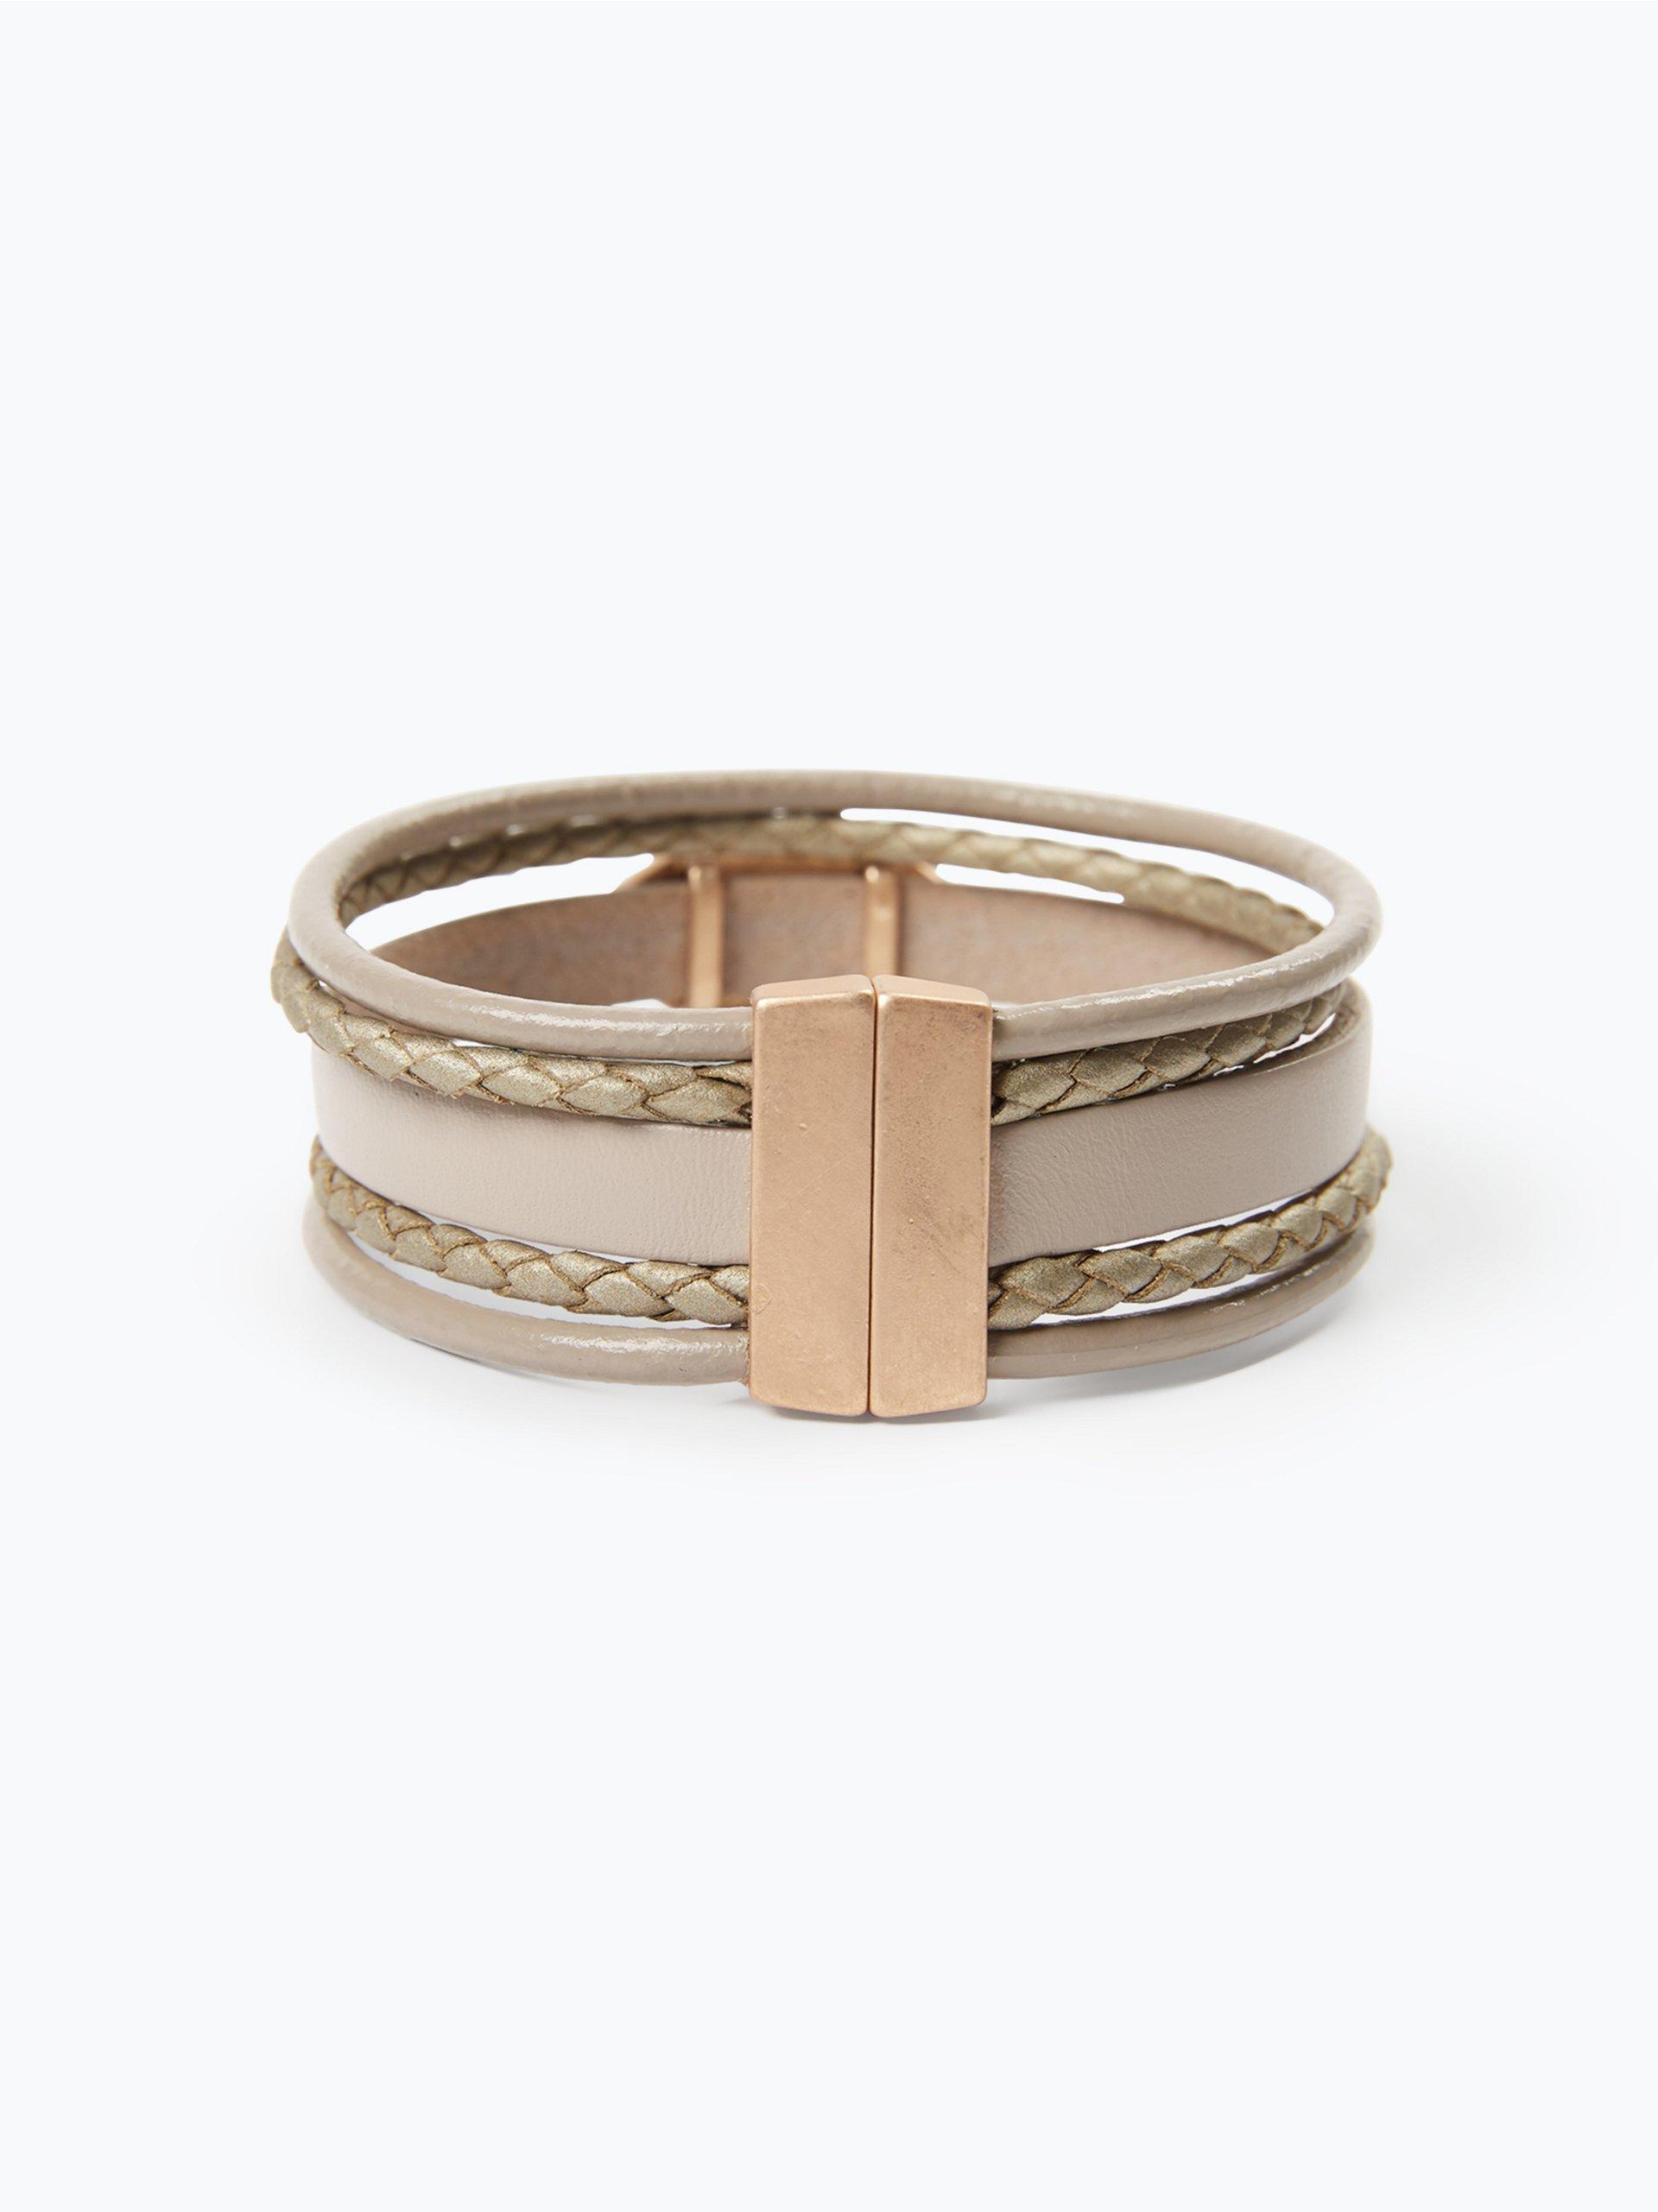 sweet deluxe damen armband in leder optik nuna grau uni. Black Bedroom Furniture Sets. Home Design Ideas